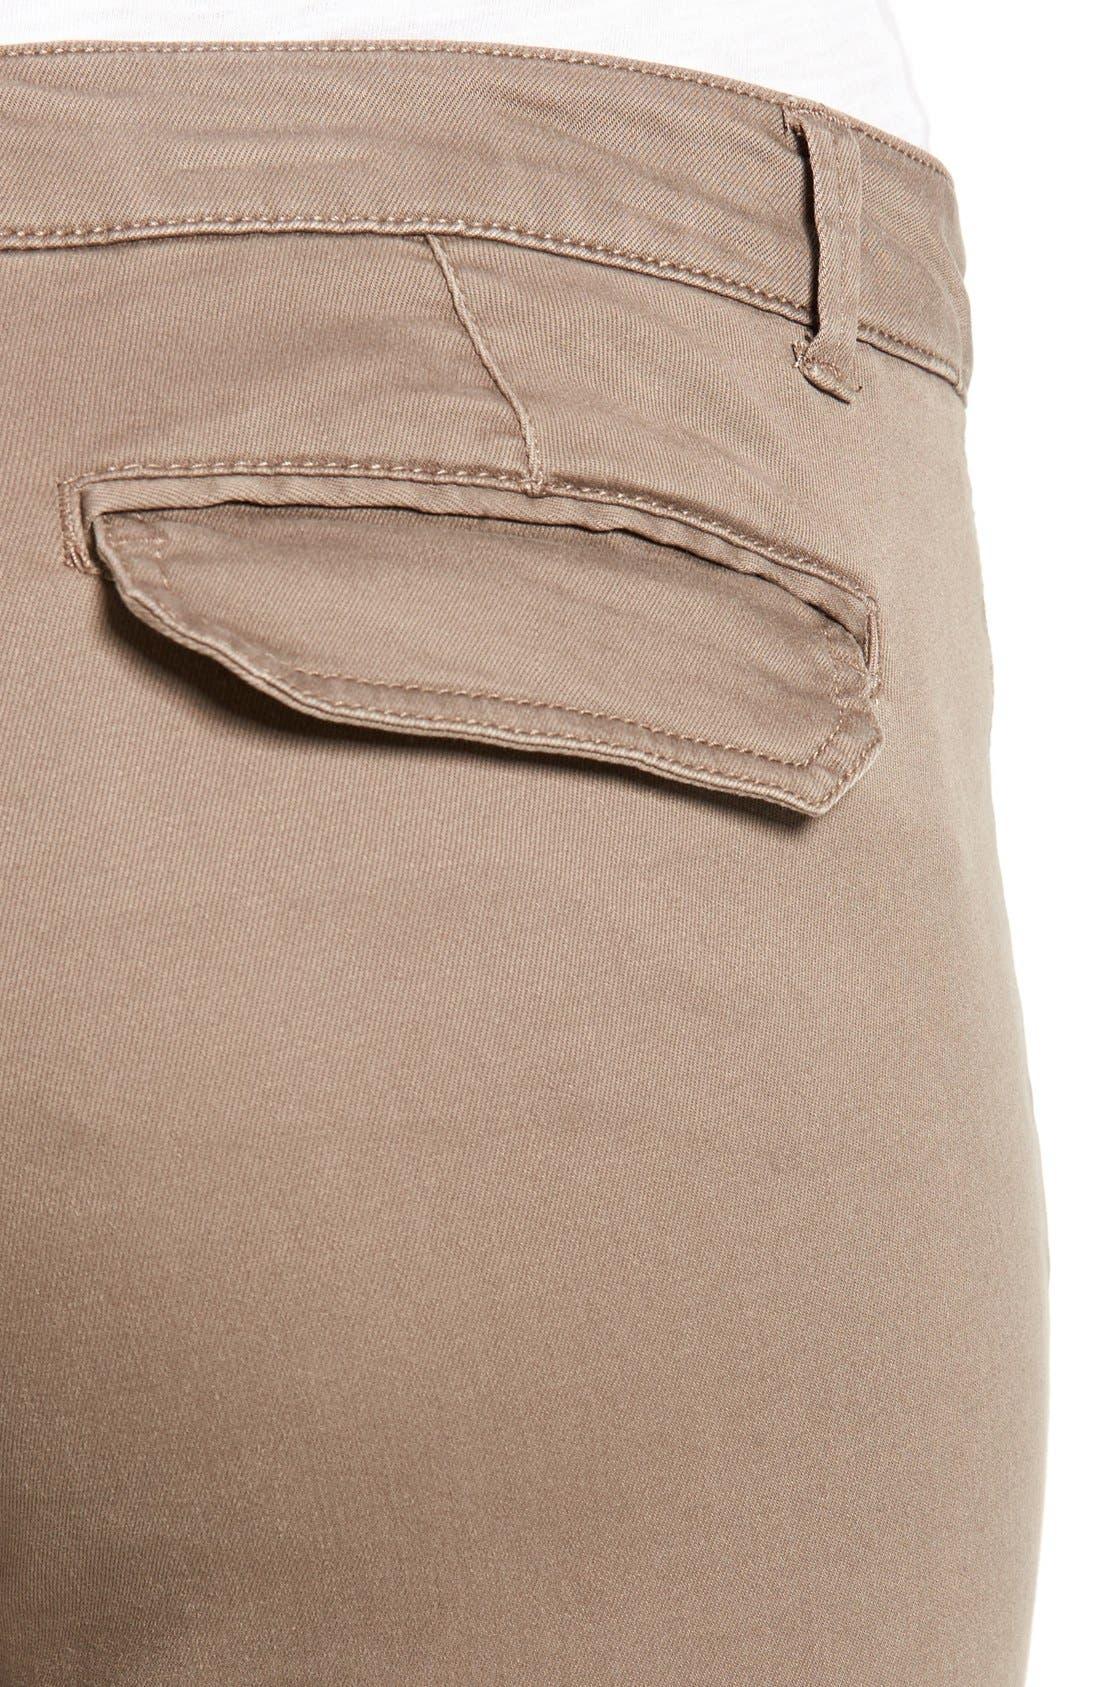 Skinny Cargo Pants,                             Alternate thumbnail 46, color,